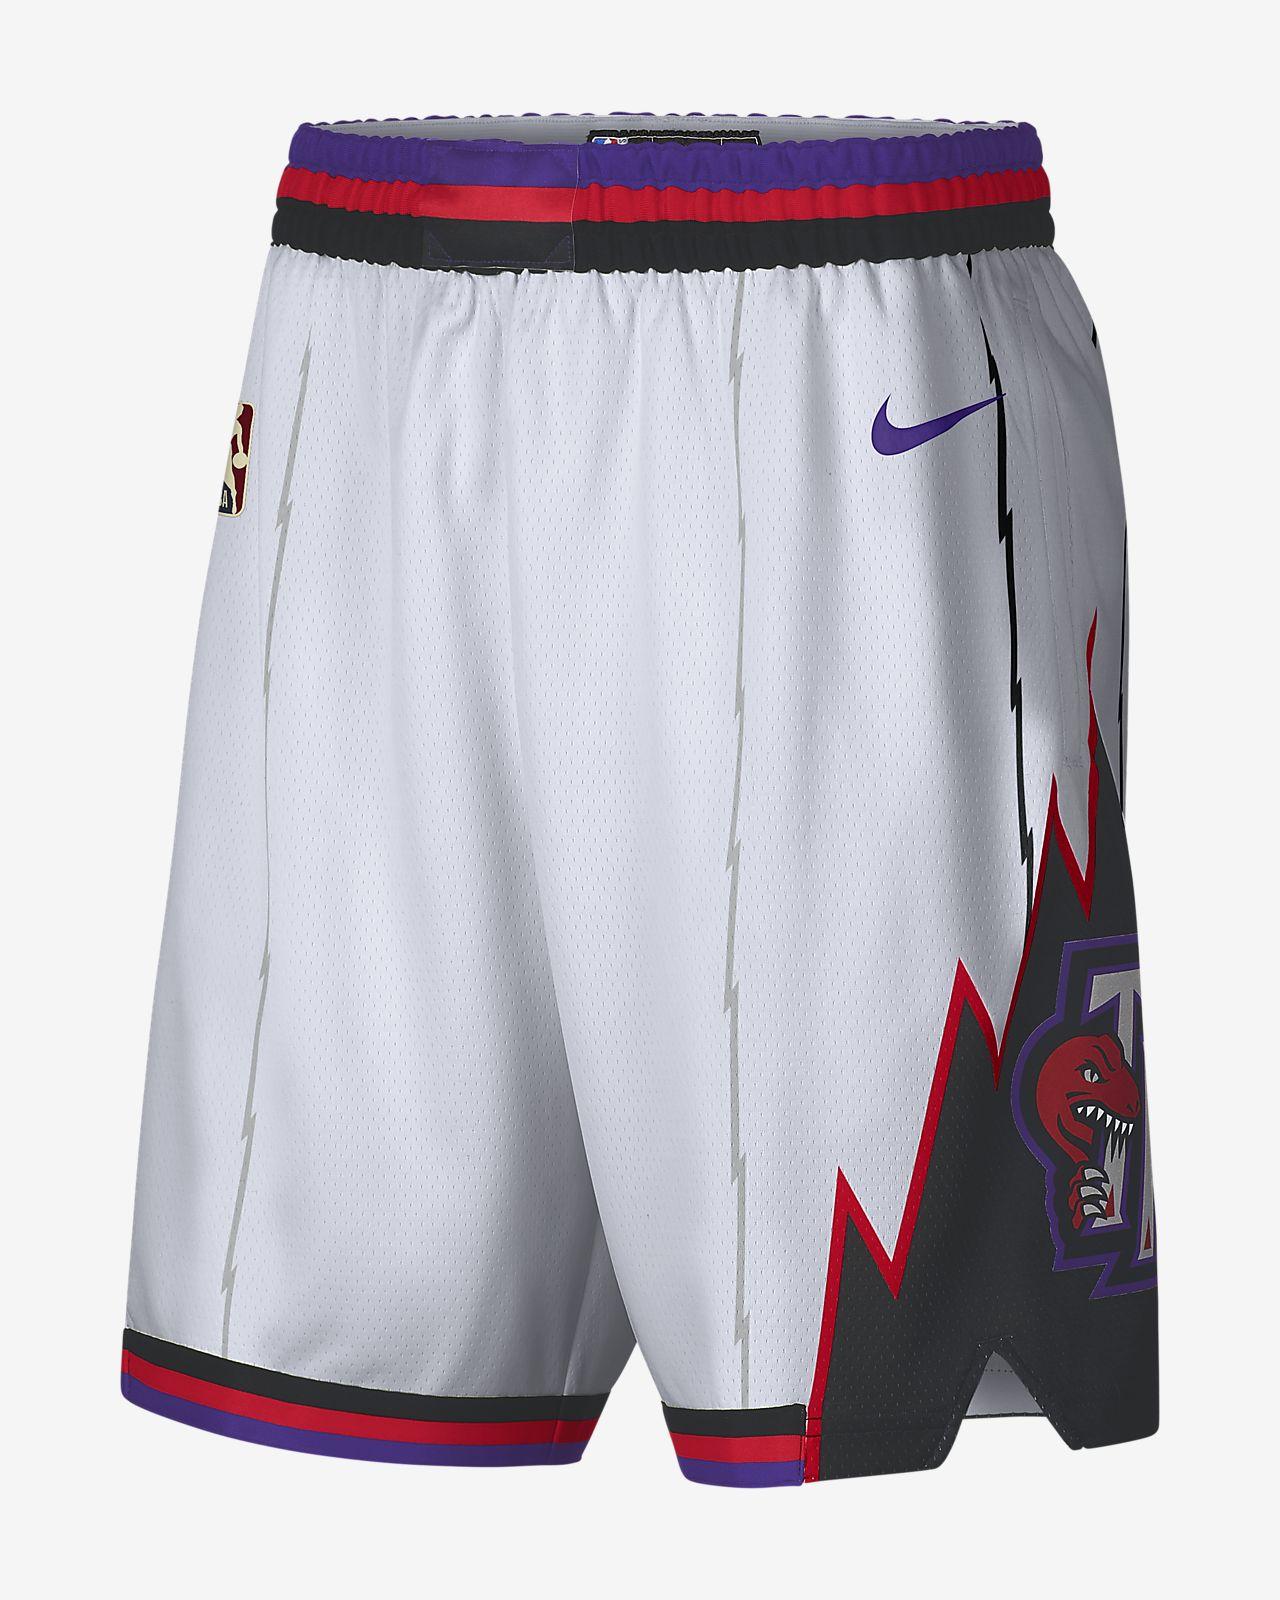 Toronto Raptors Classic Edition Swingman Nike NBA-Shorts für Herren